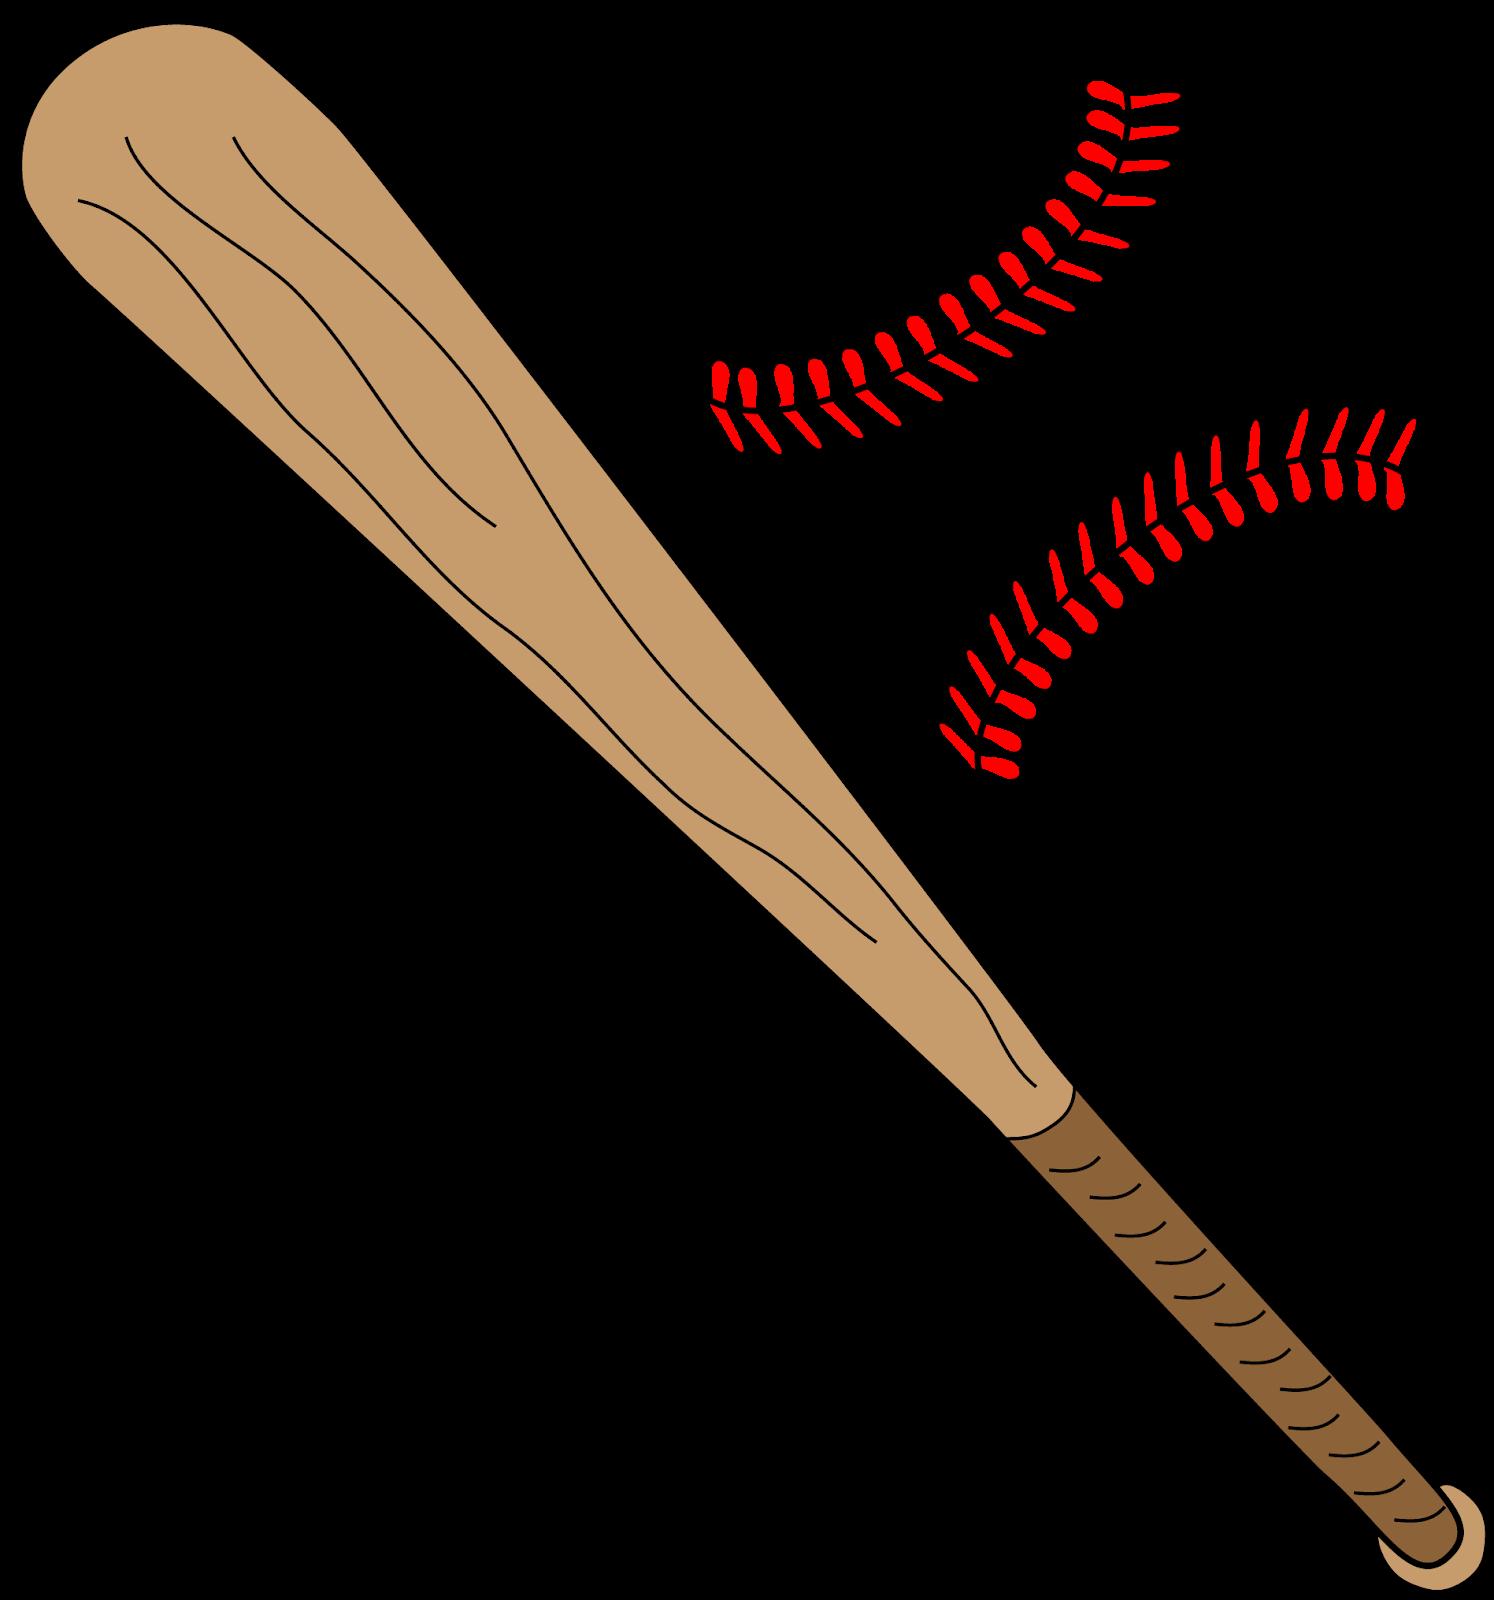 Varsity baseball 2017 clipart svg stock Summerton S.C. Blog: Local Clarendon County SC High School Varsity ... svg stock